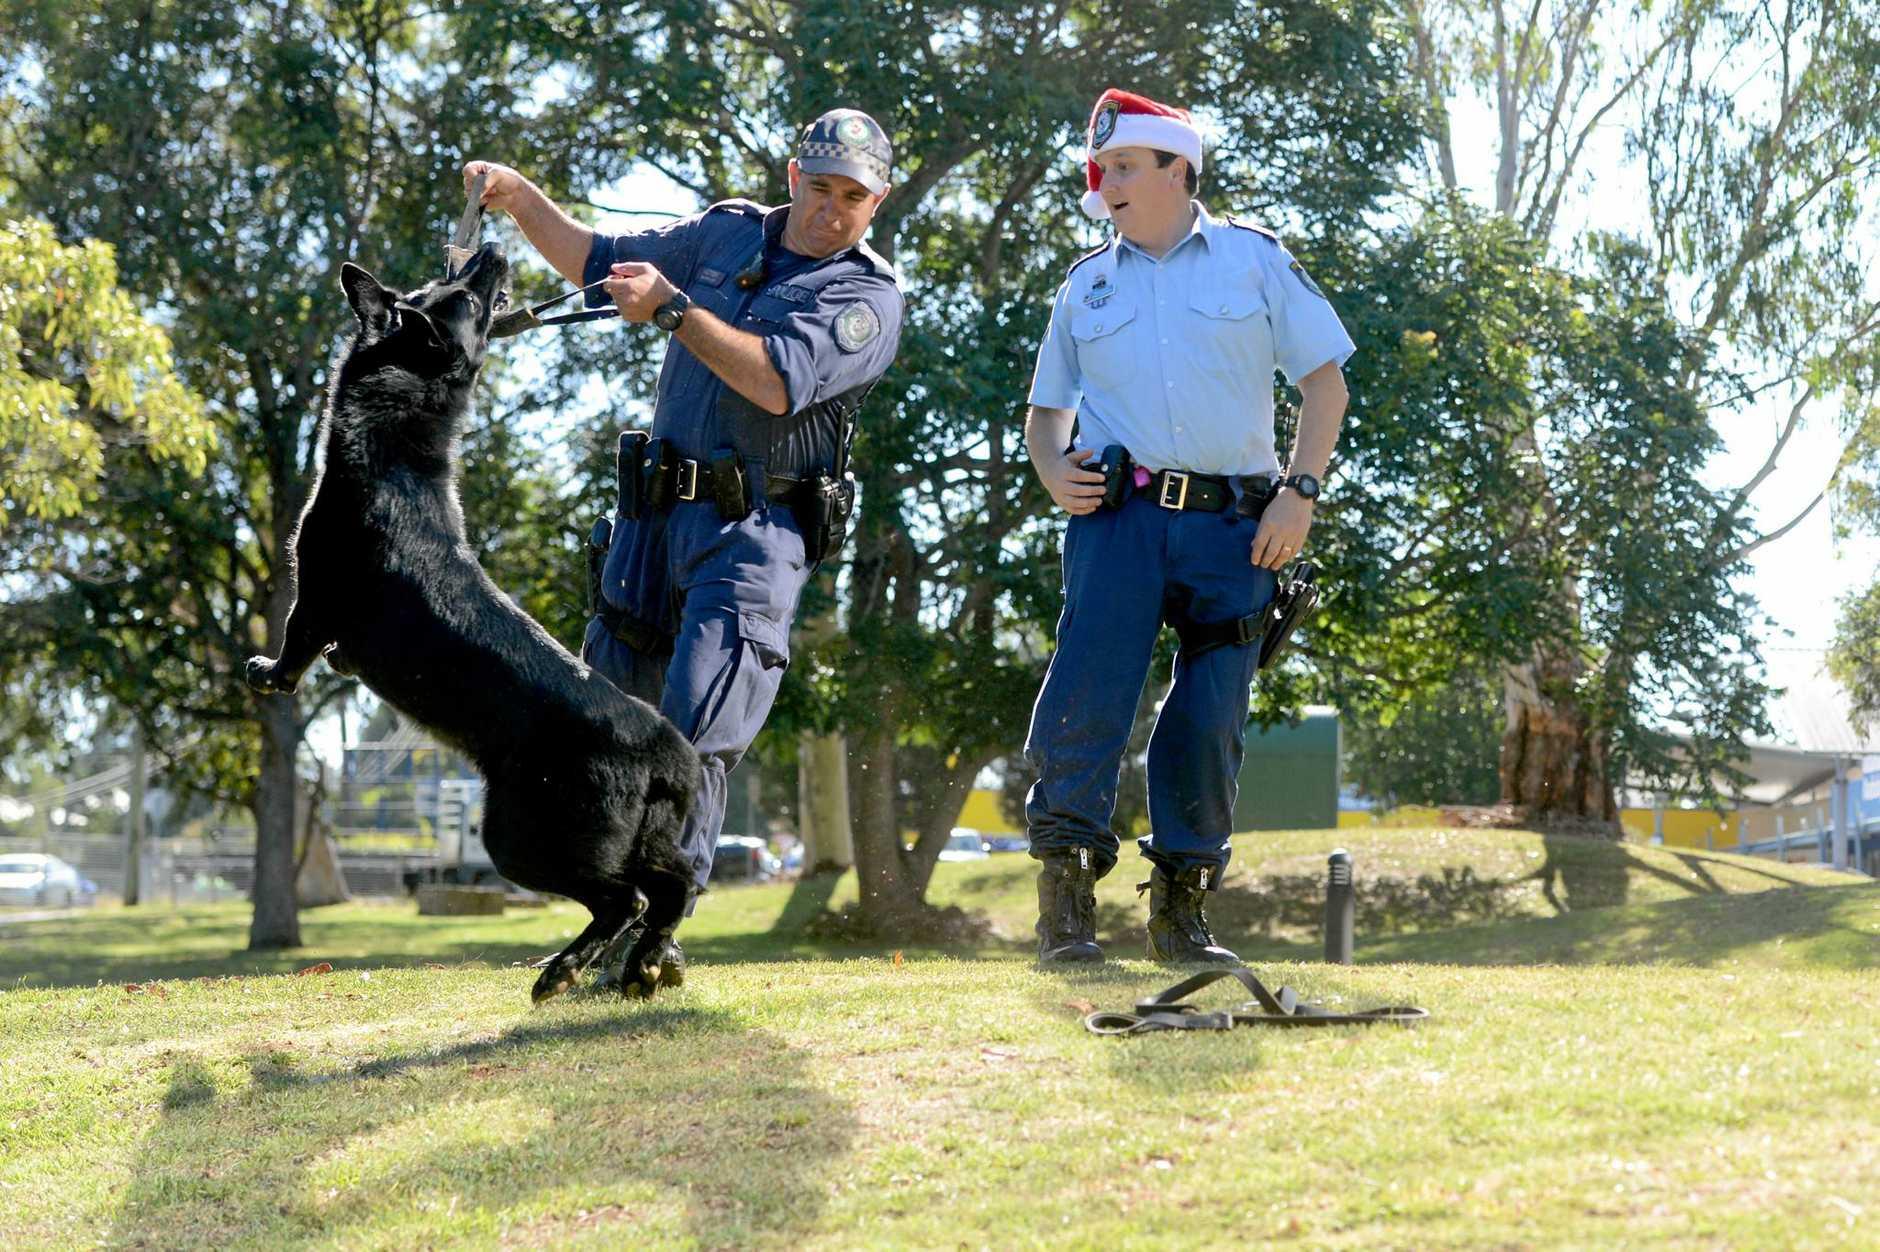 Having some festive fun are Senior Constable Dave Kotek, police dog Ken and Senior Constable David Henderson from the Richmond Local Area Command Crime Prevention Unit.